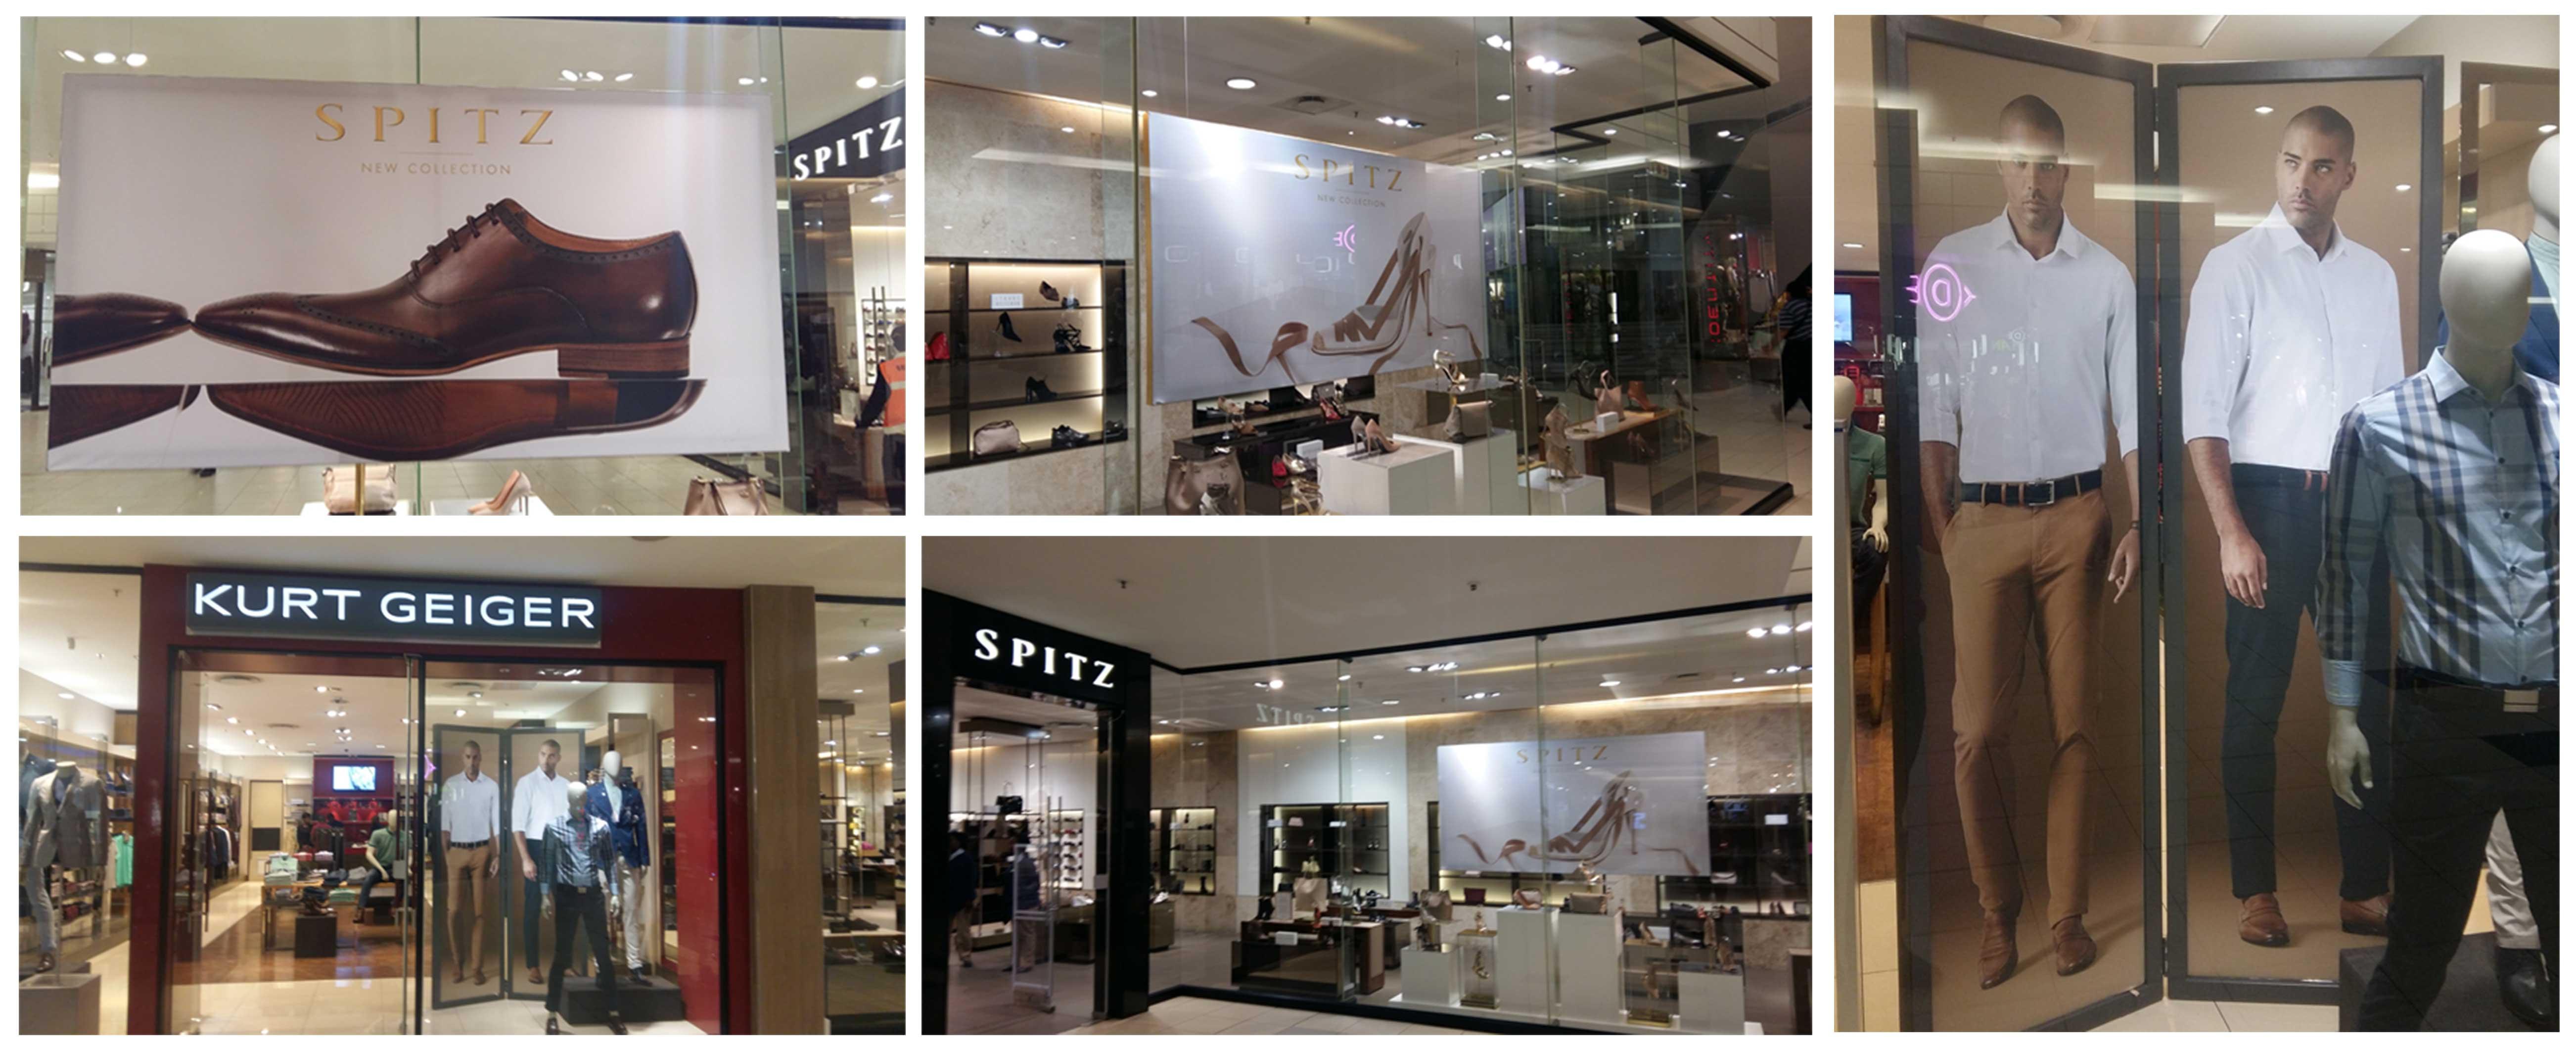 Spitz & Kurt Geiger 2016 Instore Branding campaign